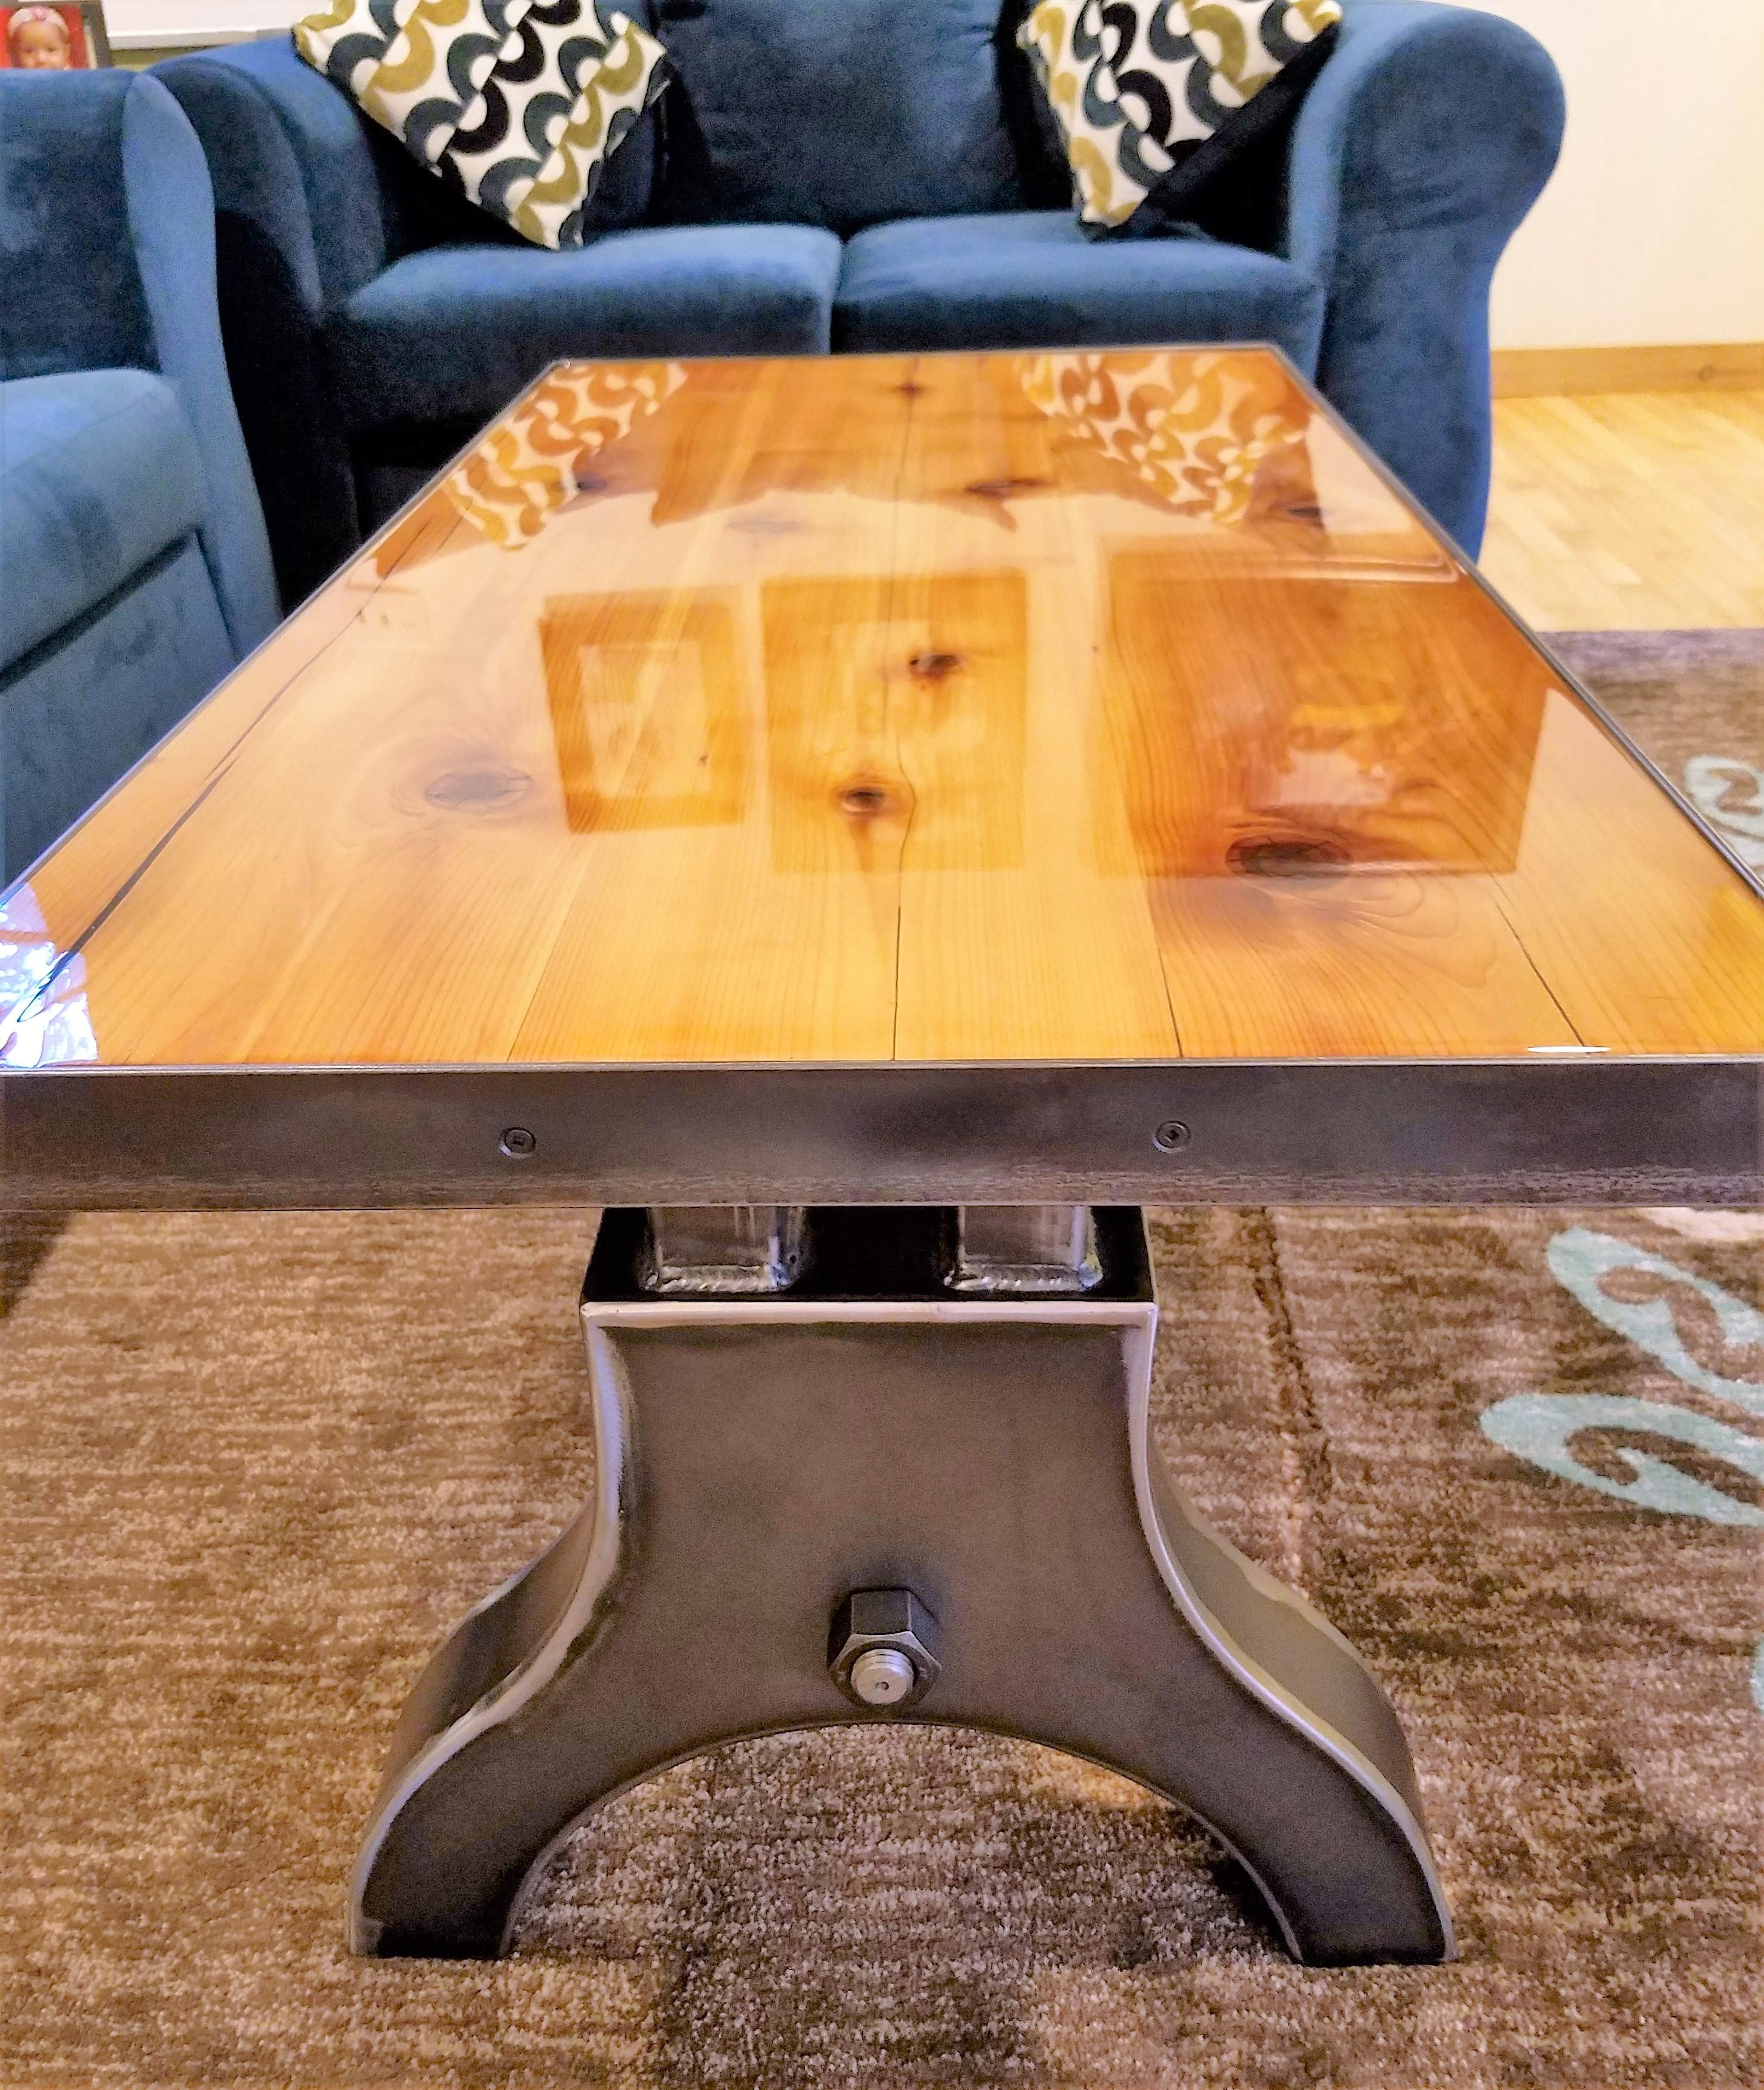 cem-coffee-table-5.jpg Steel and Wood Coffee Talbes